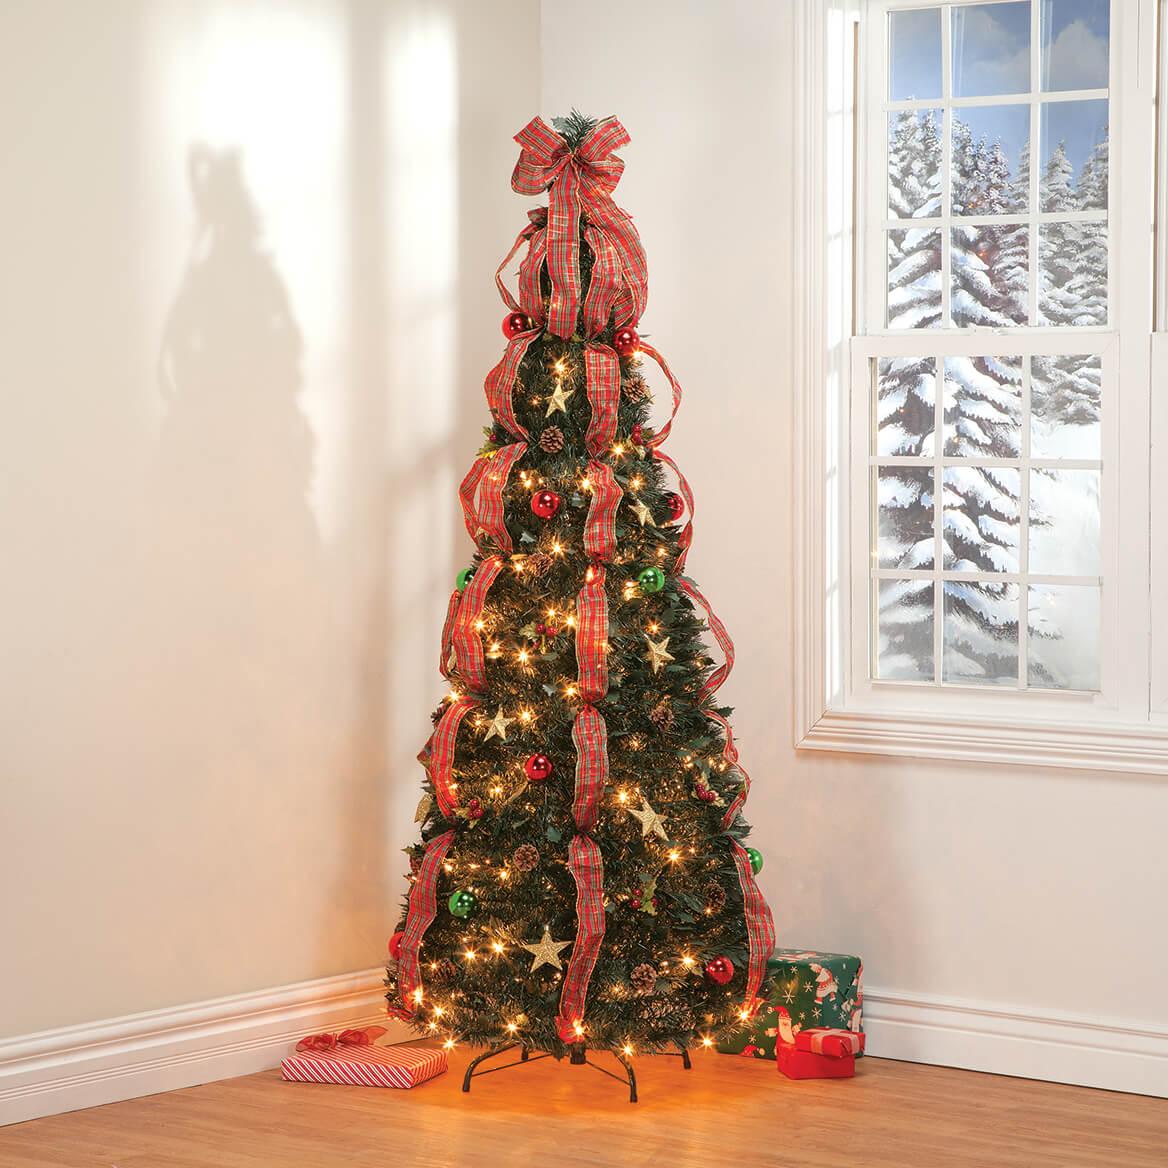 6' Plaid Pull-Up Tree by Holiday Peak™         XL-368143